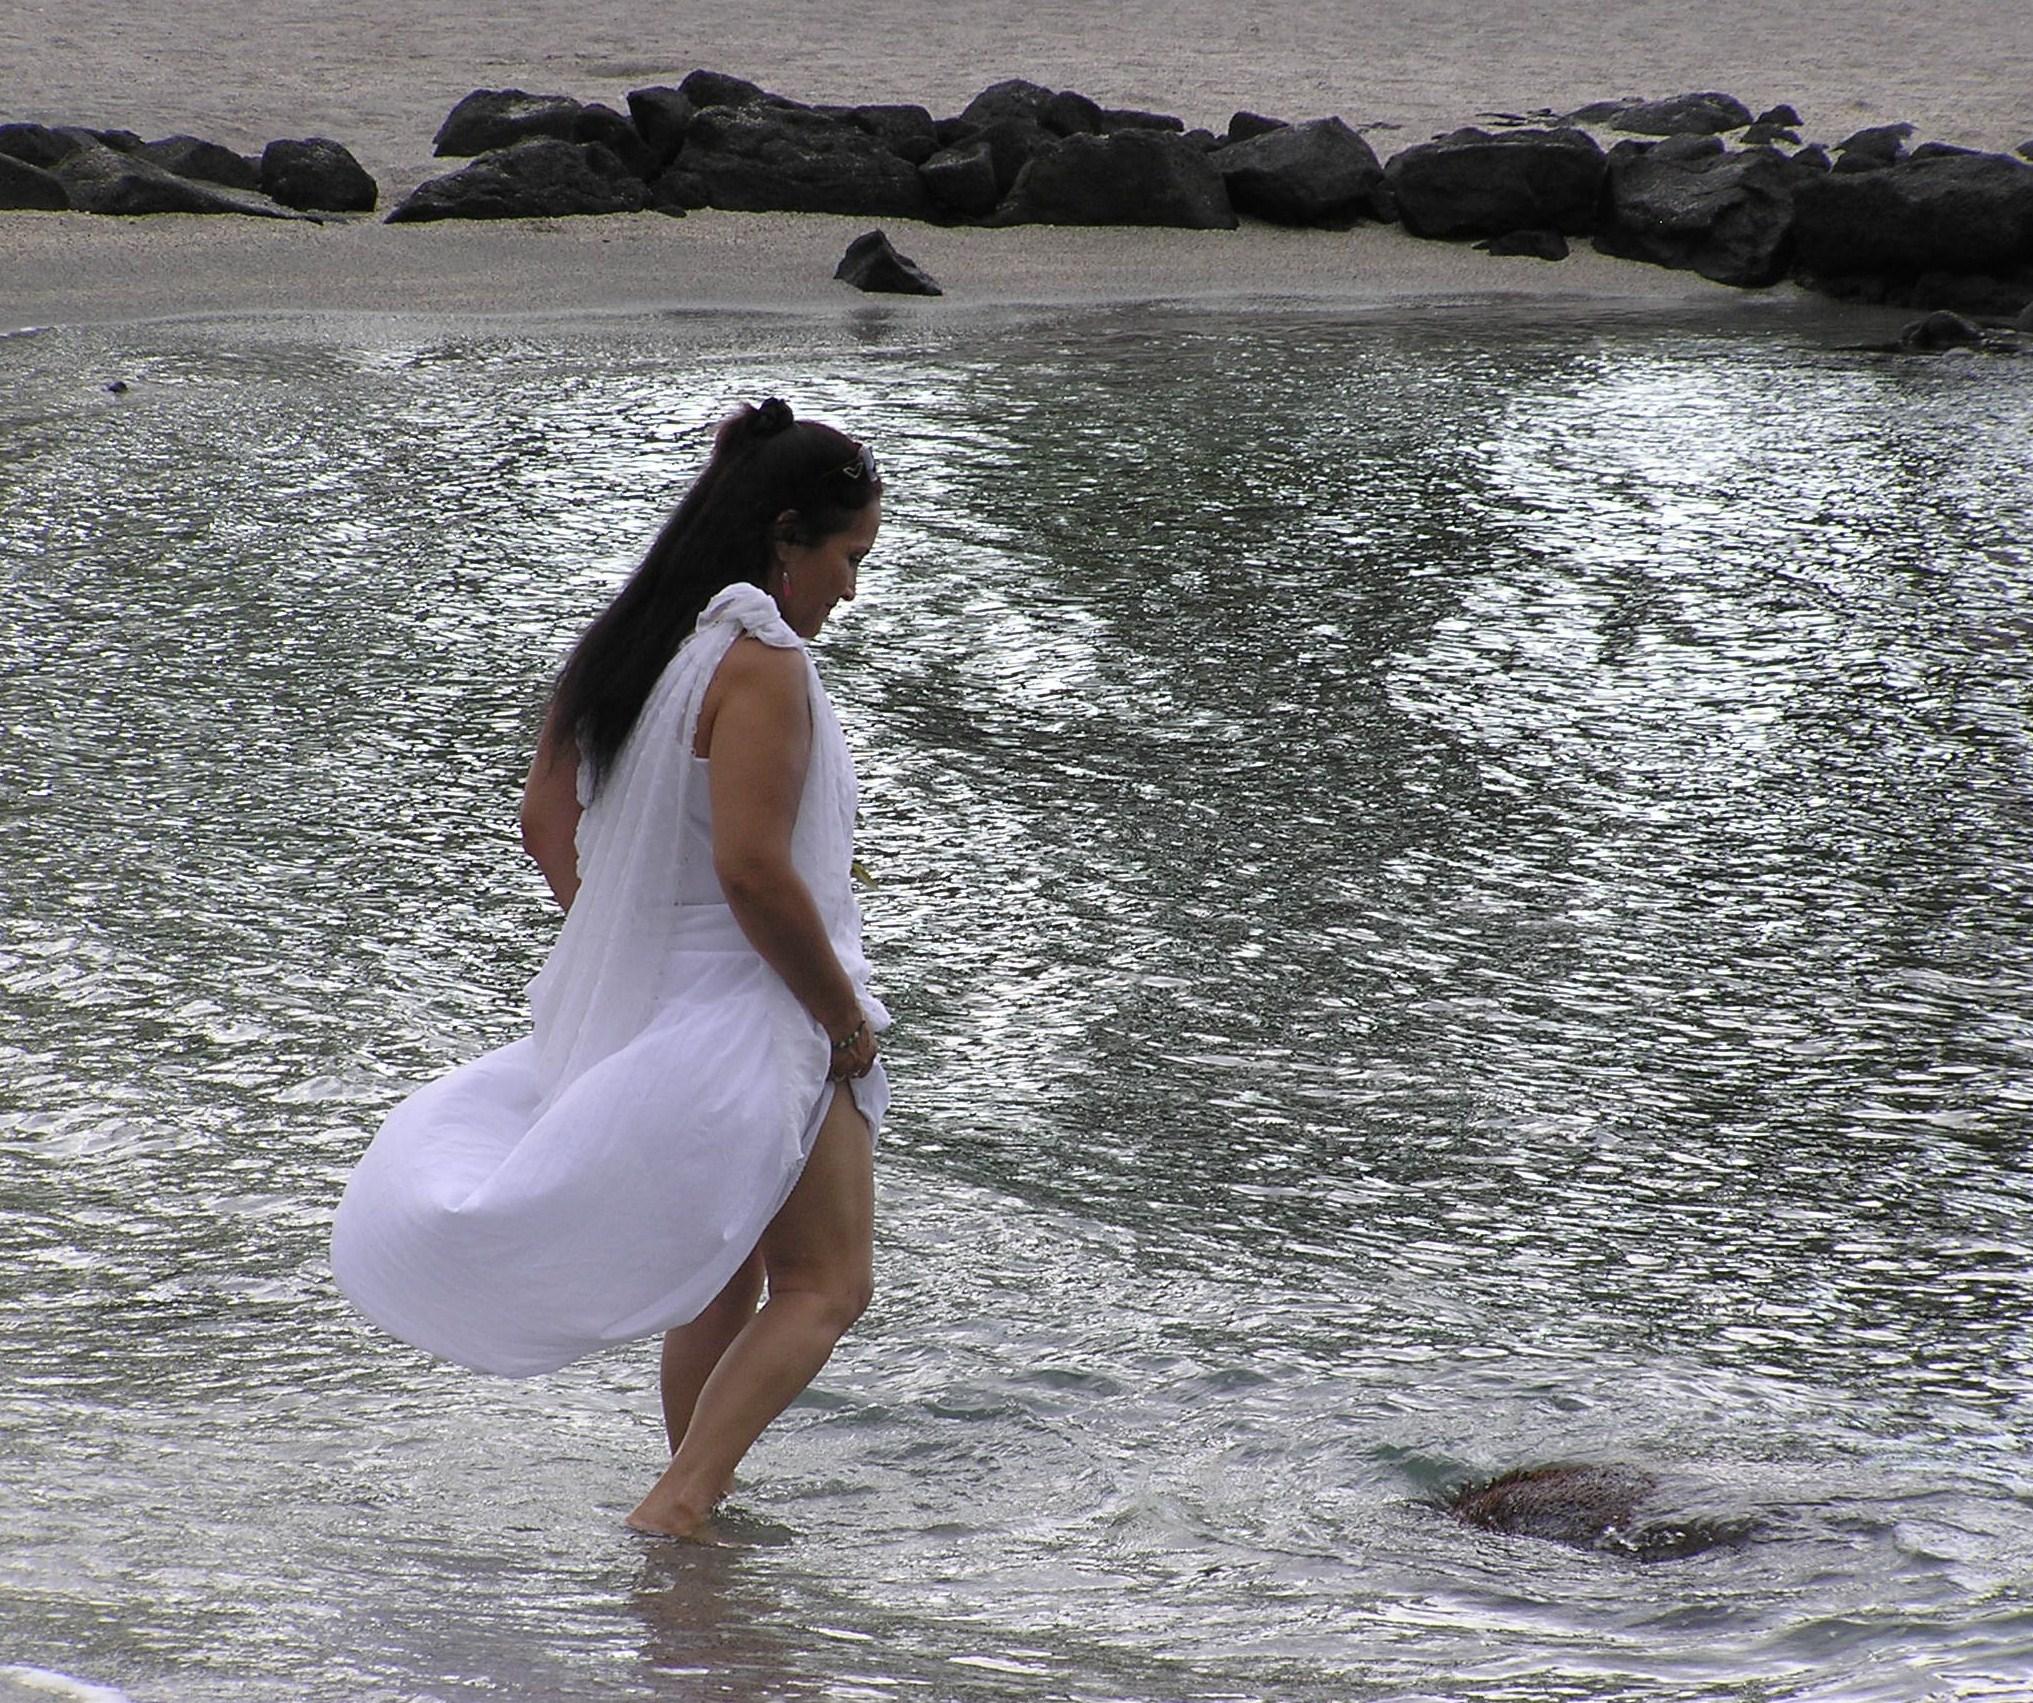 17 kumu in water.JPG